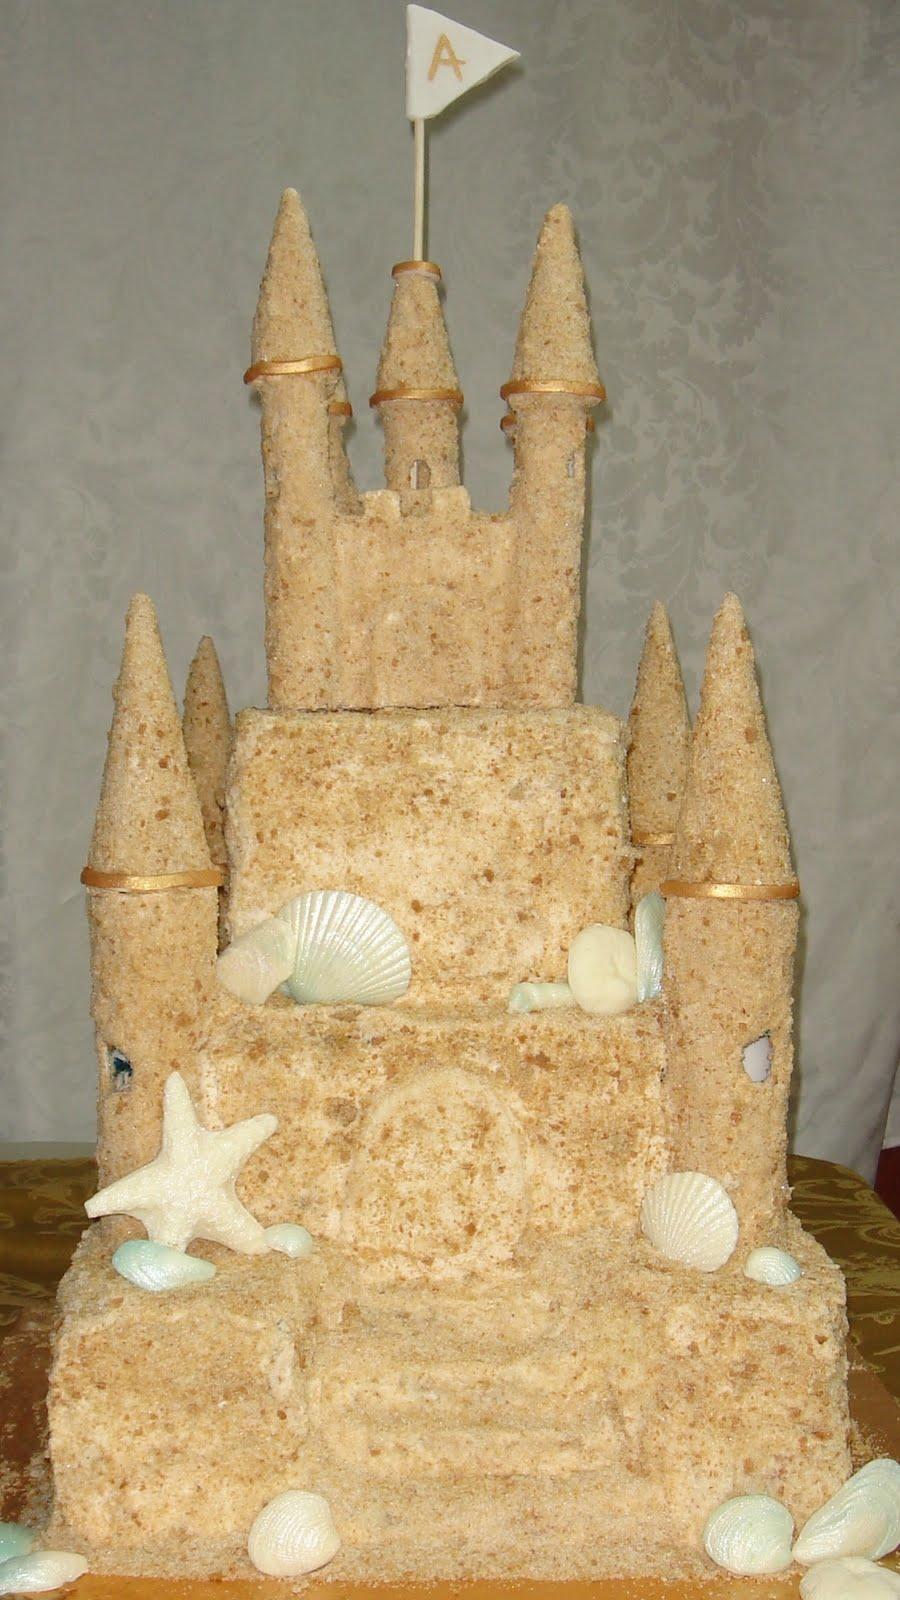 Cake Art Eats Bakery Page 59